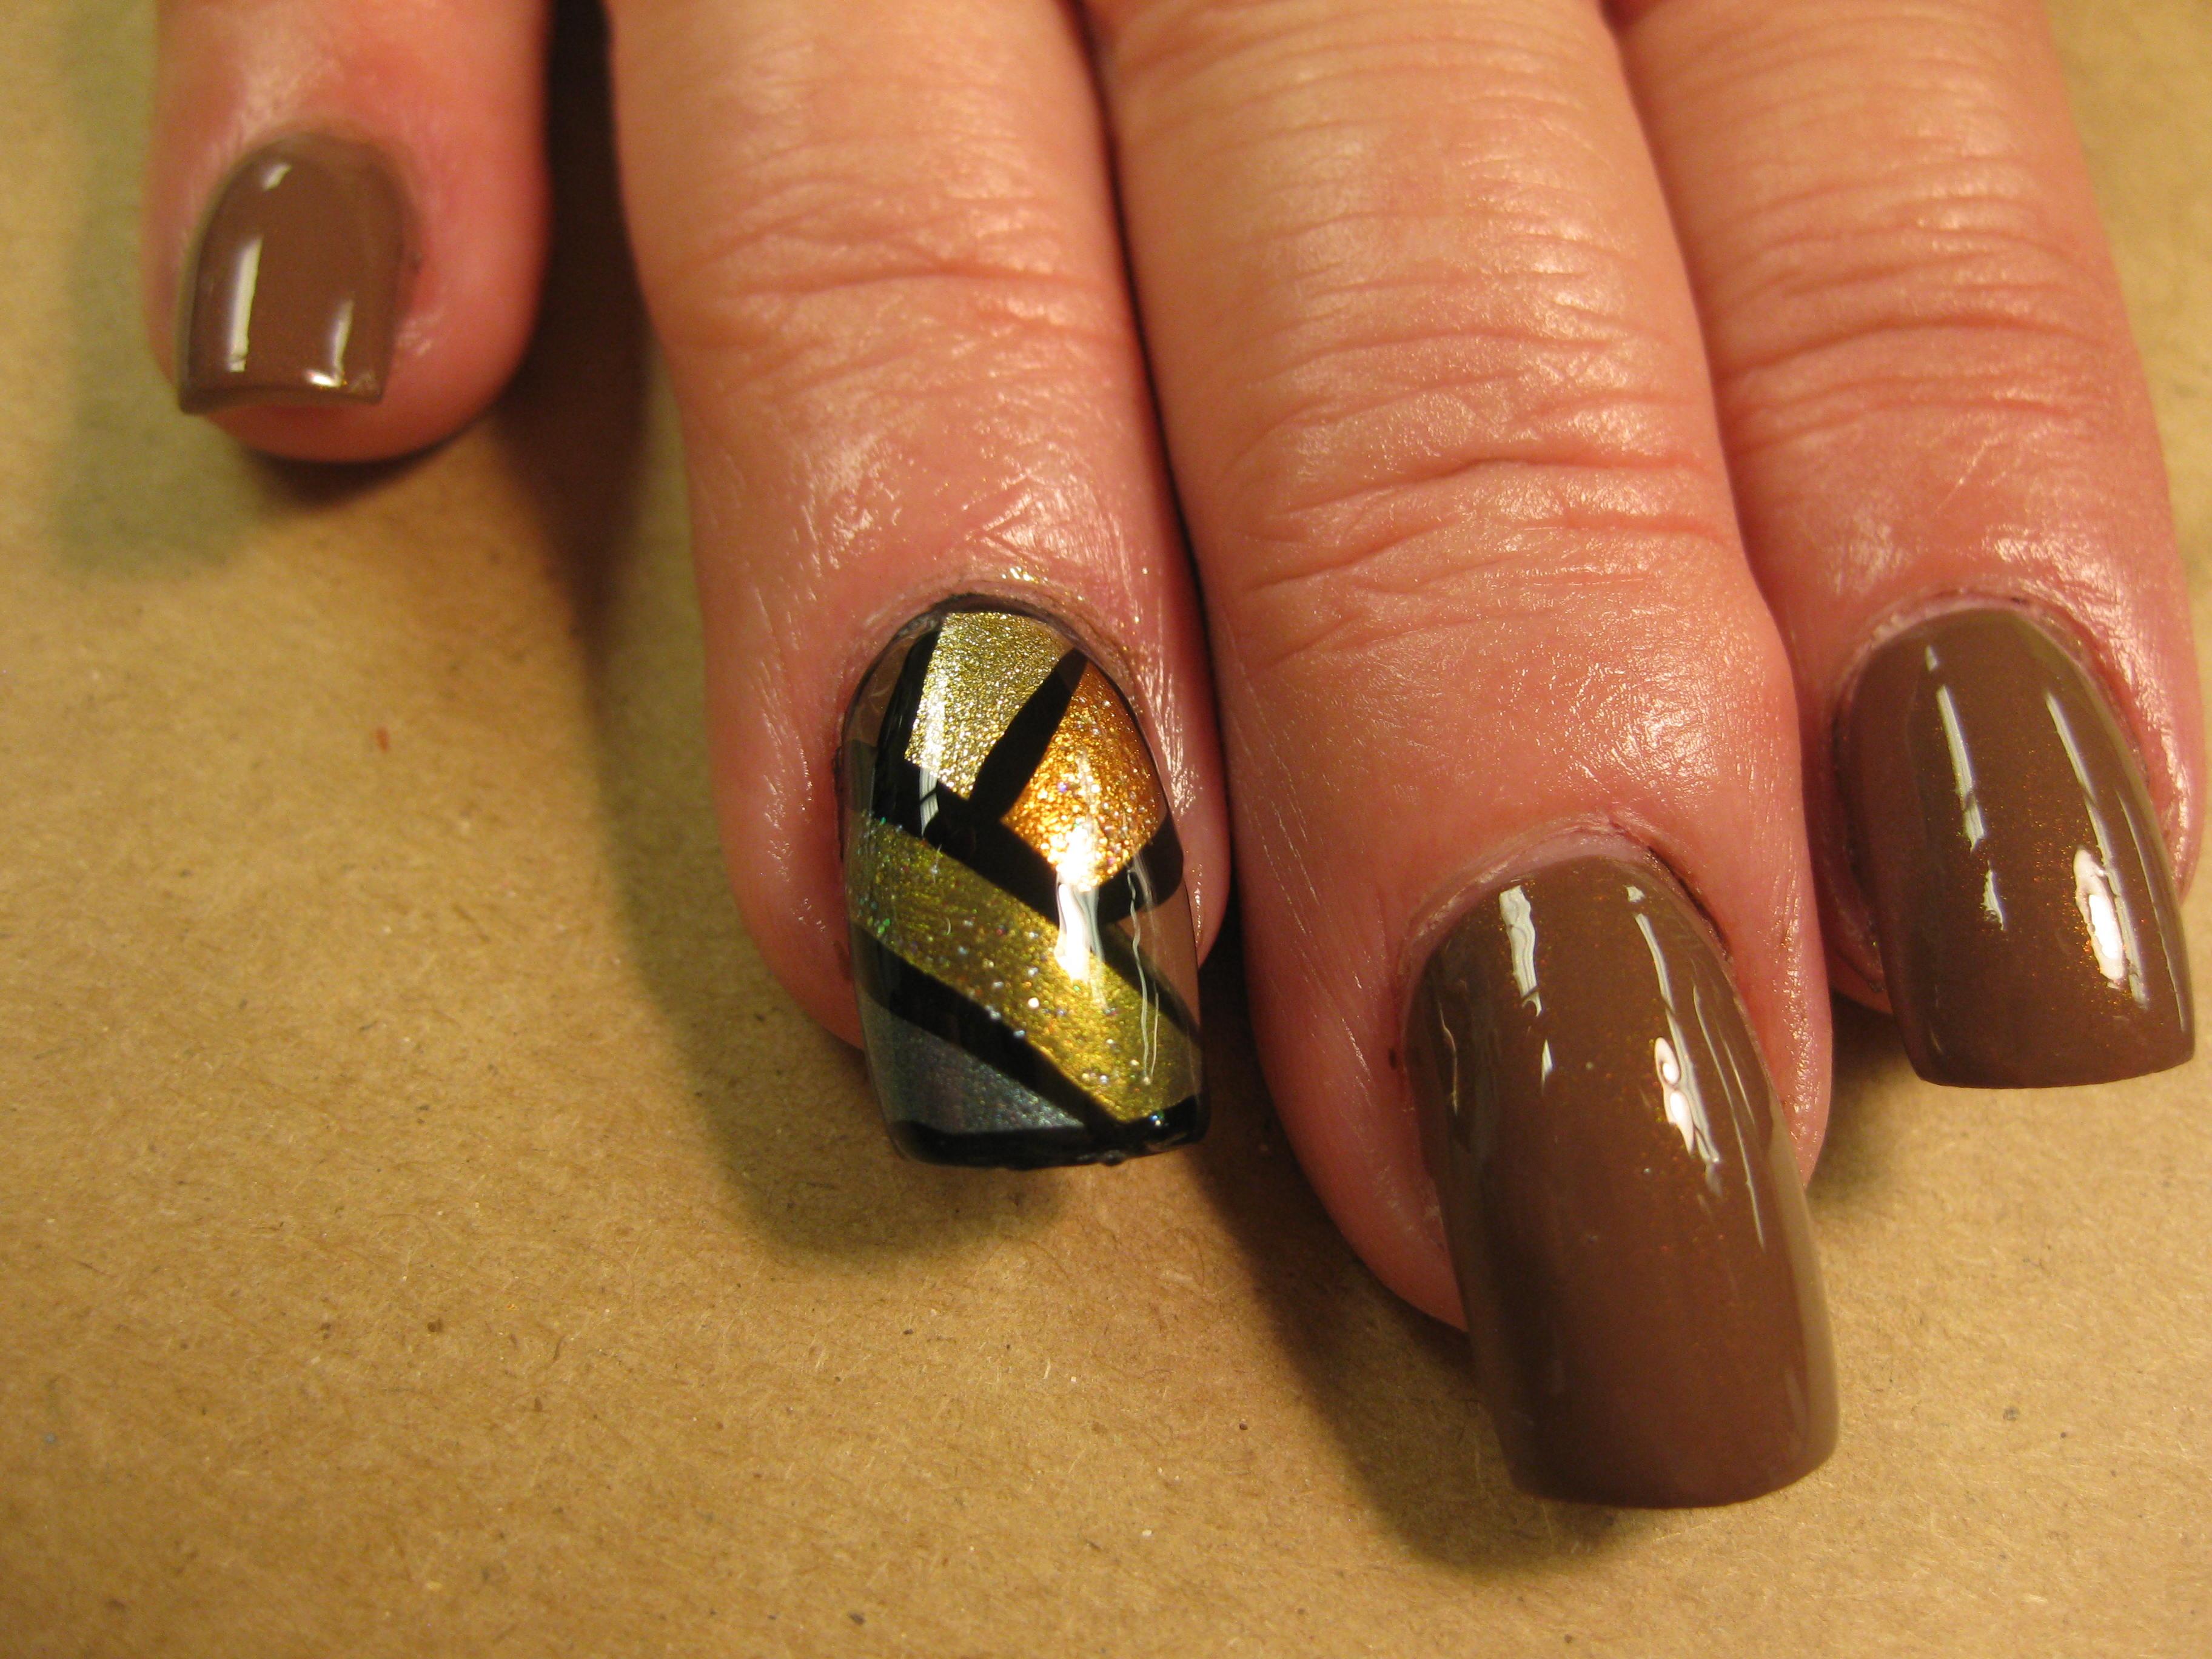 Fingers N Faces Nail Spa & Hair Salon 213 S Villa Ave, Villa Park ...